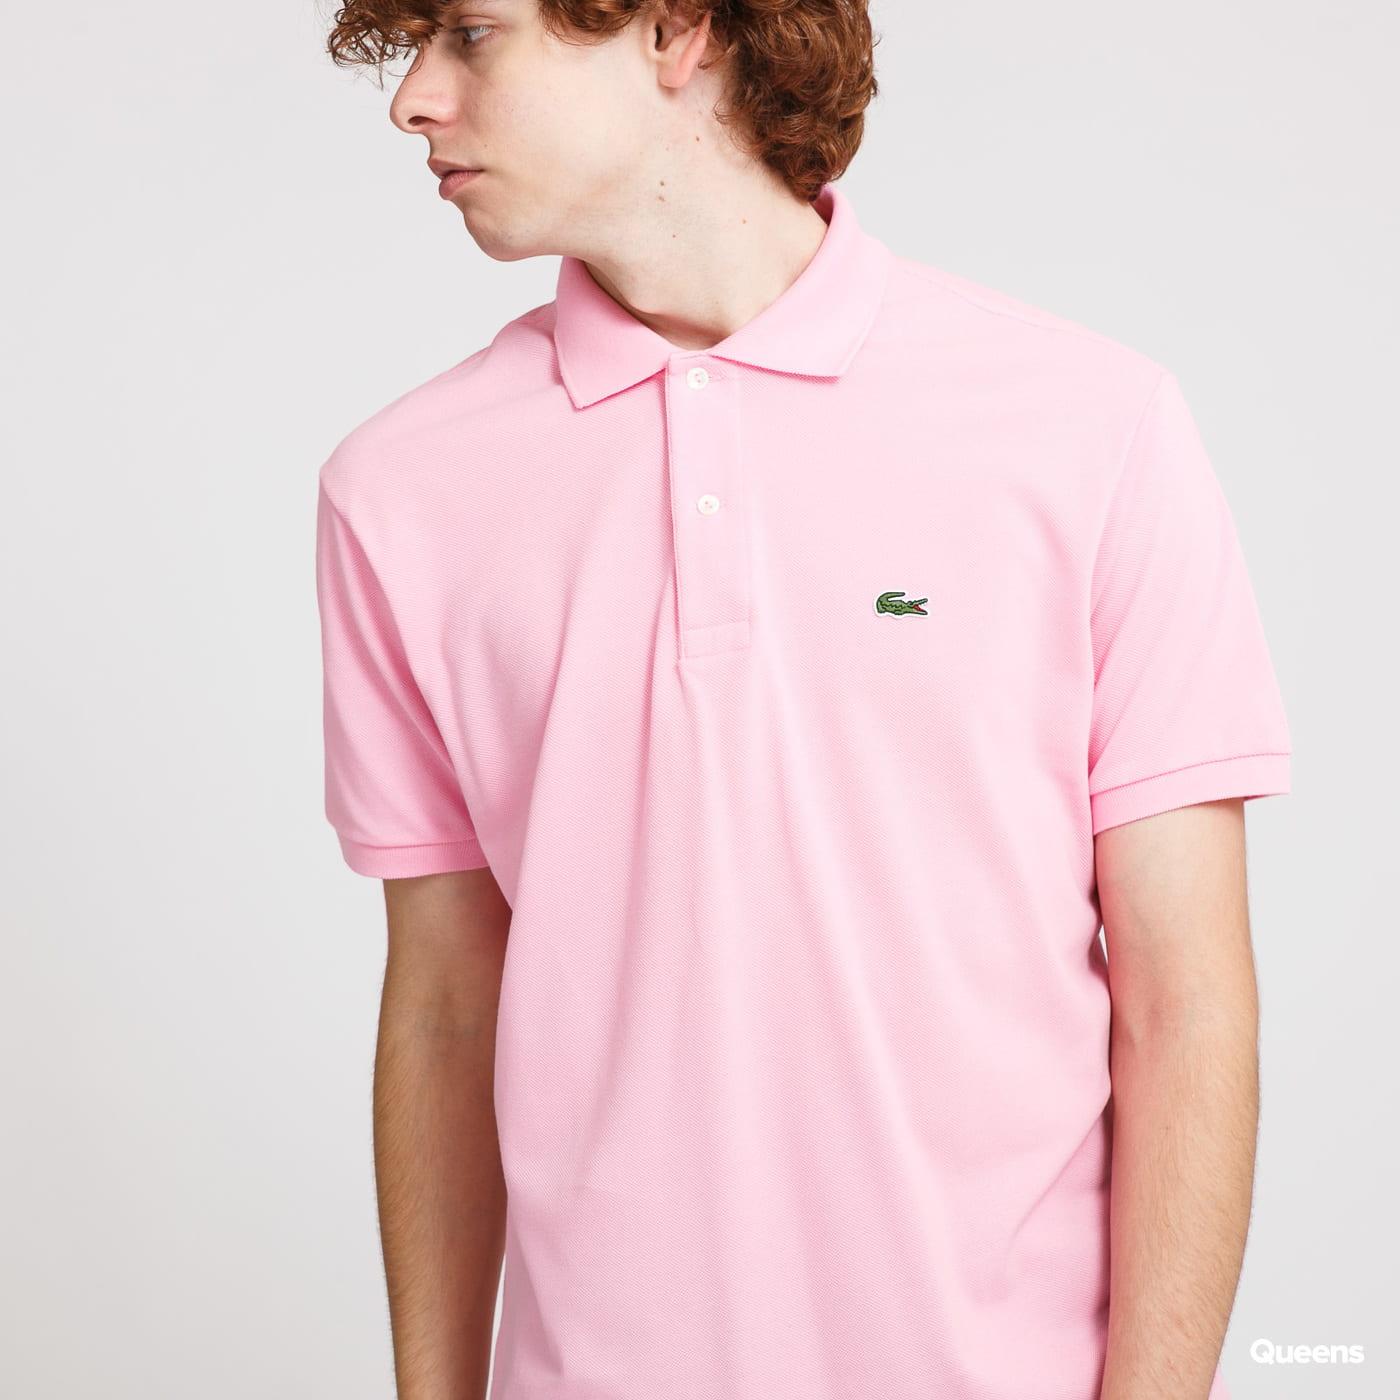 LACOSTE Men's Polo T-Shirt růžové